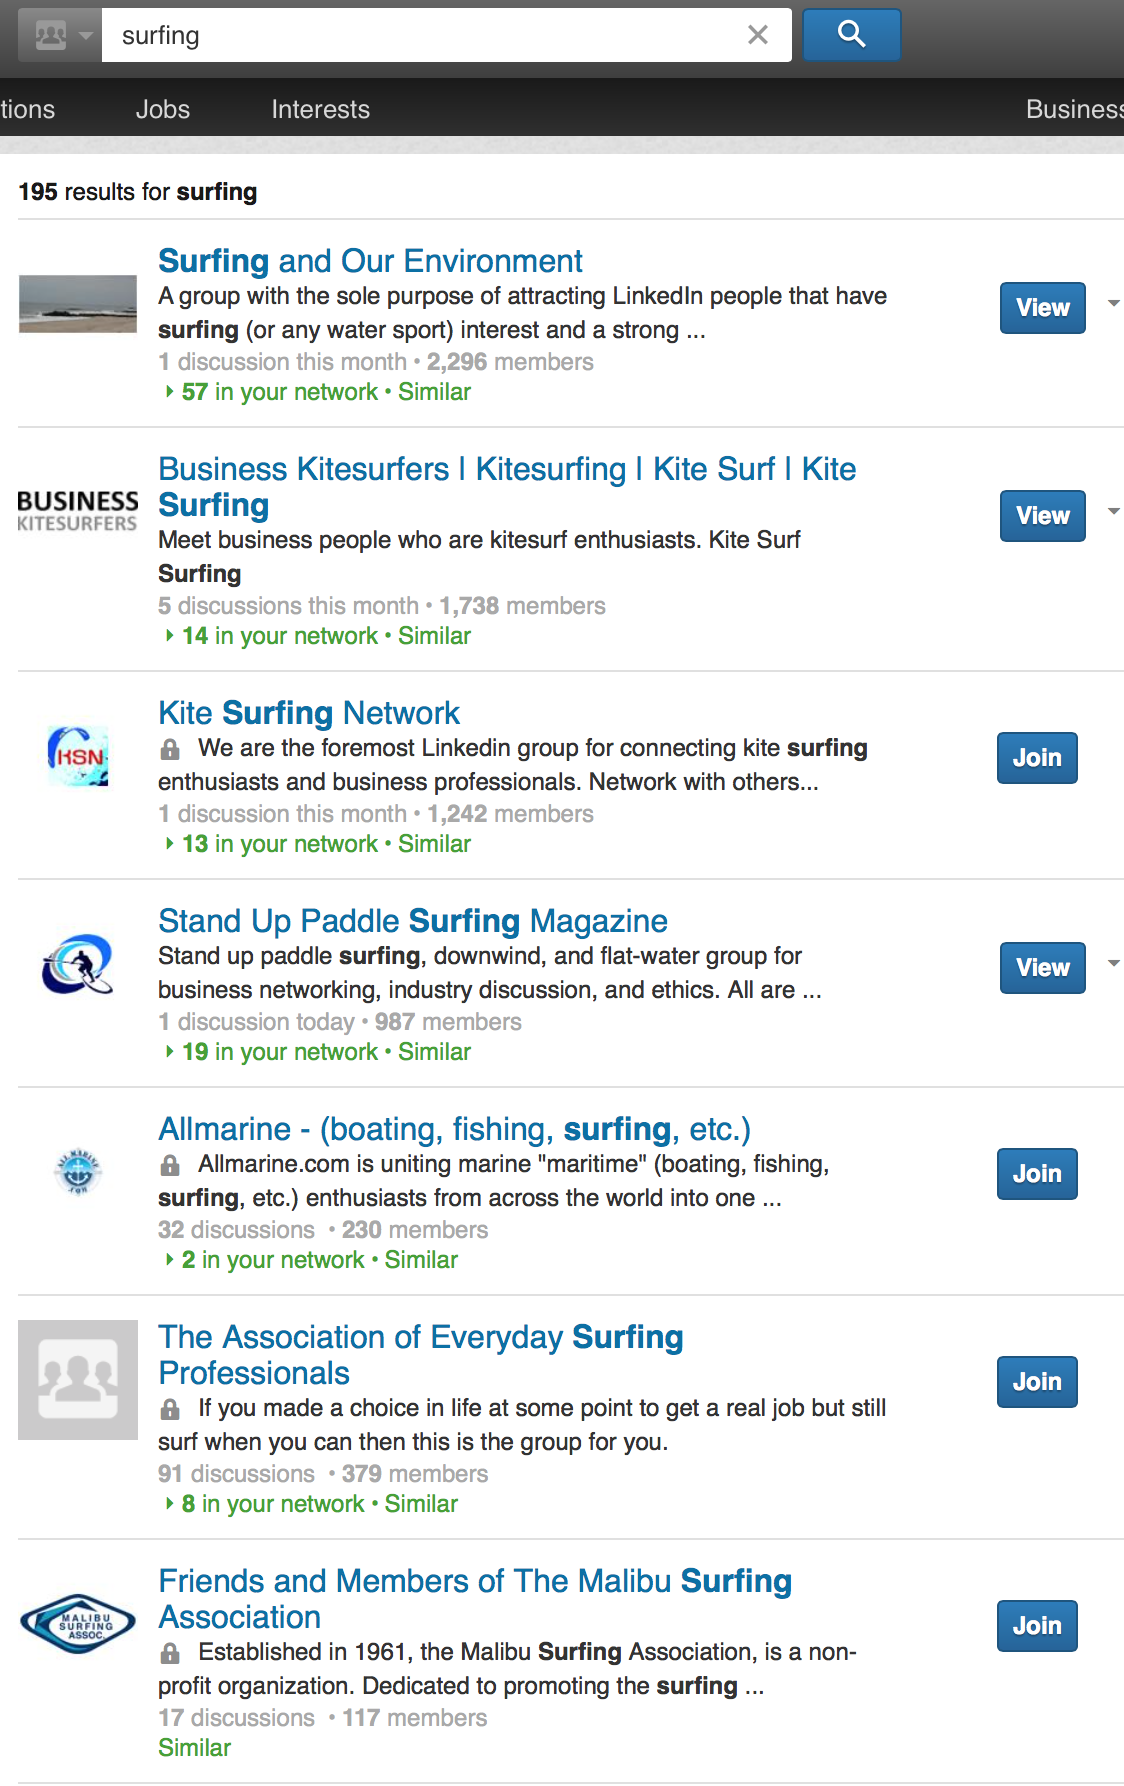 linkedin surfing groups